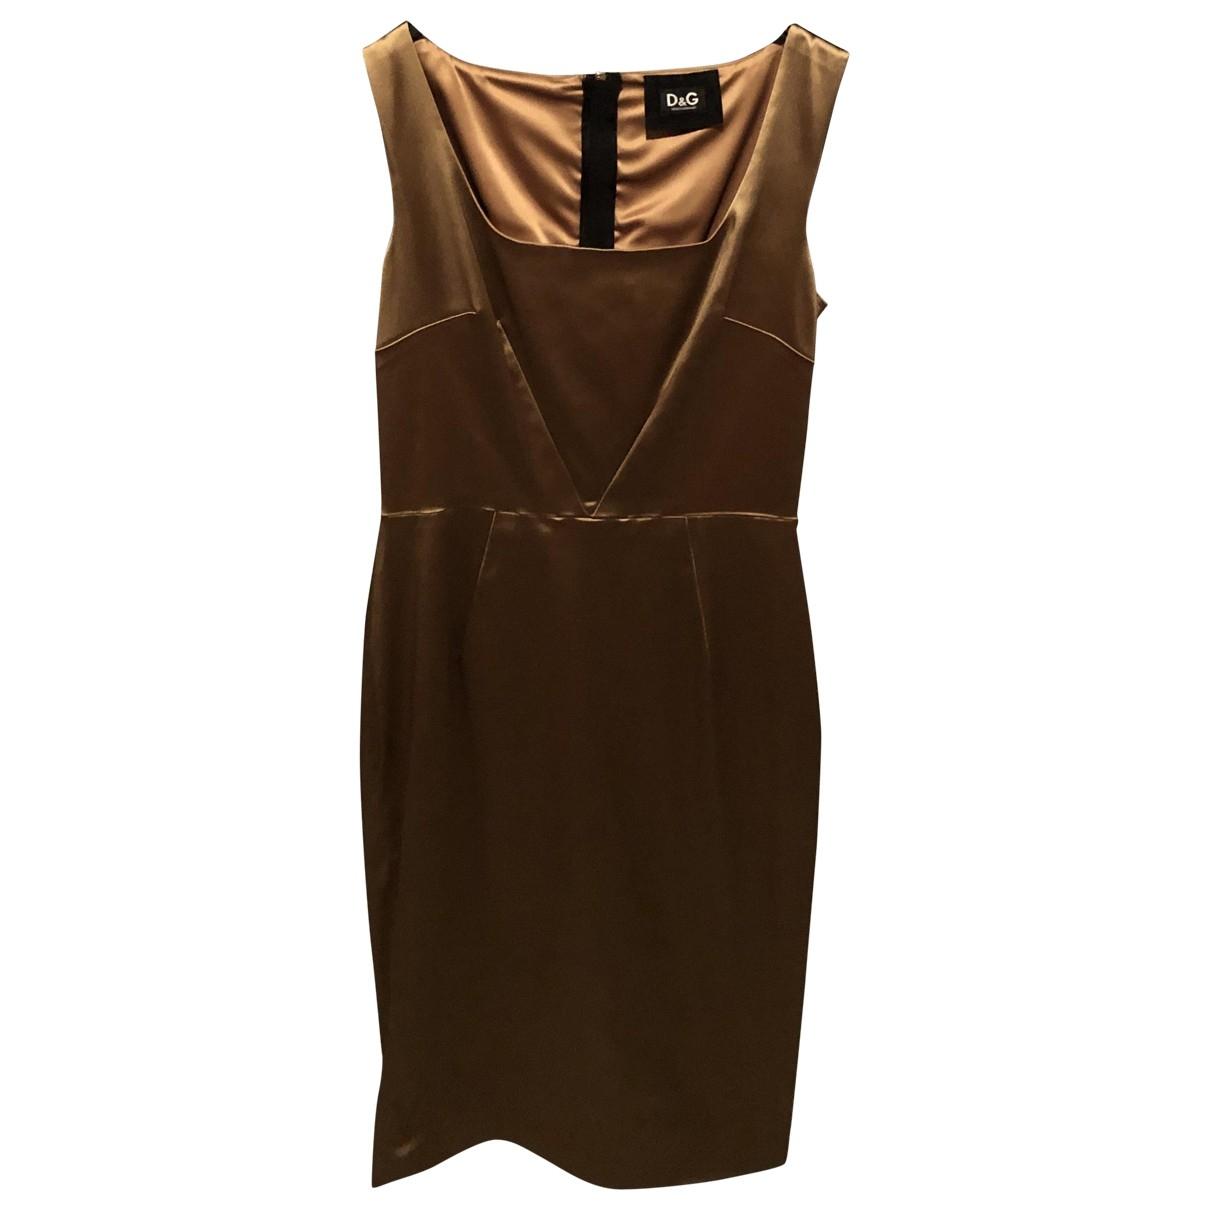 D&g \N Gold dress for Women 46 IT